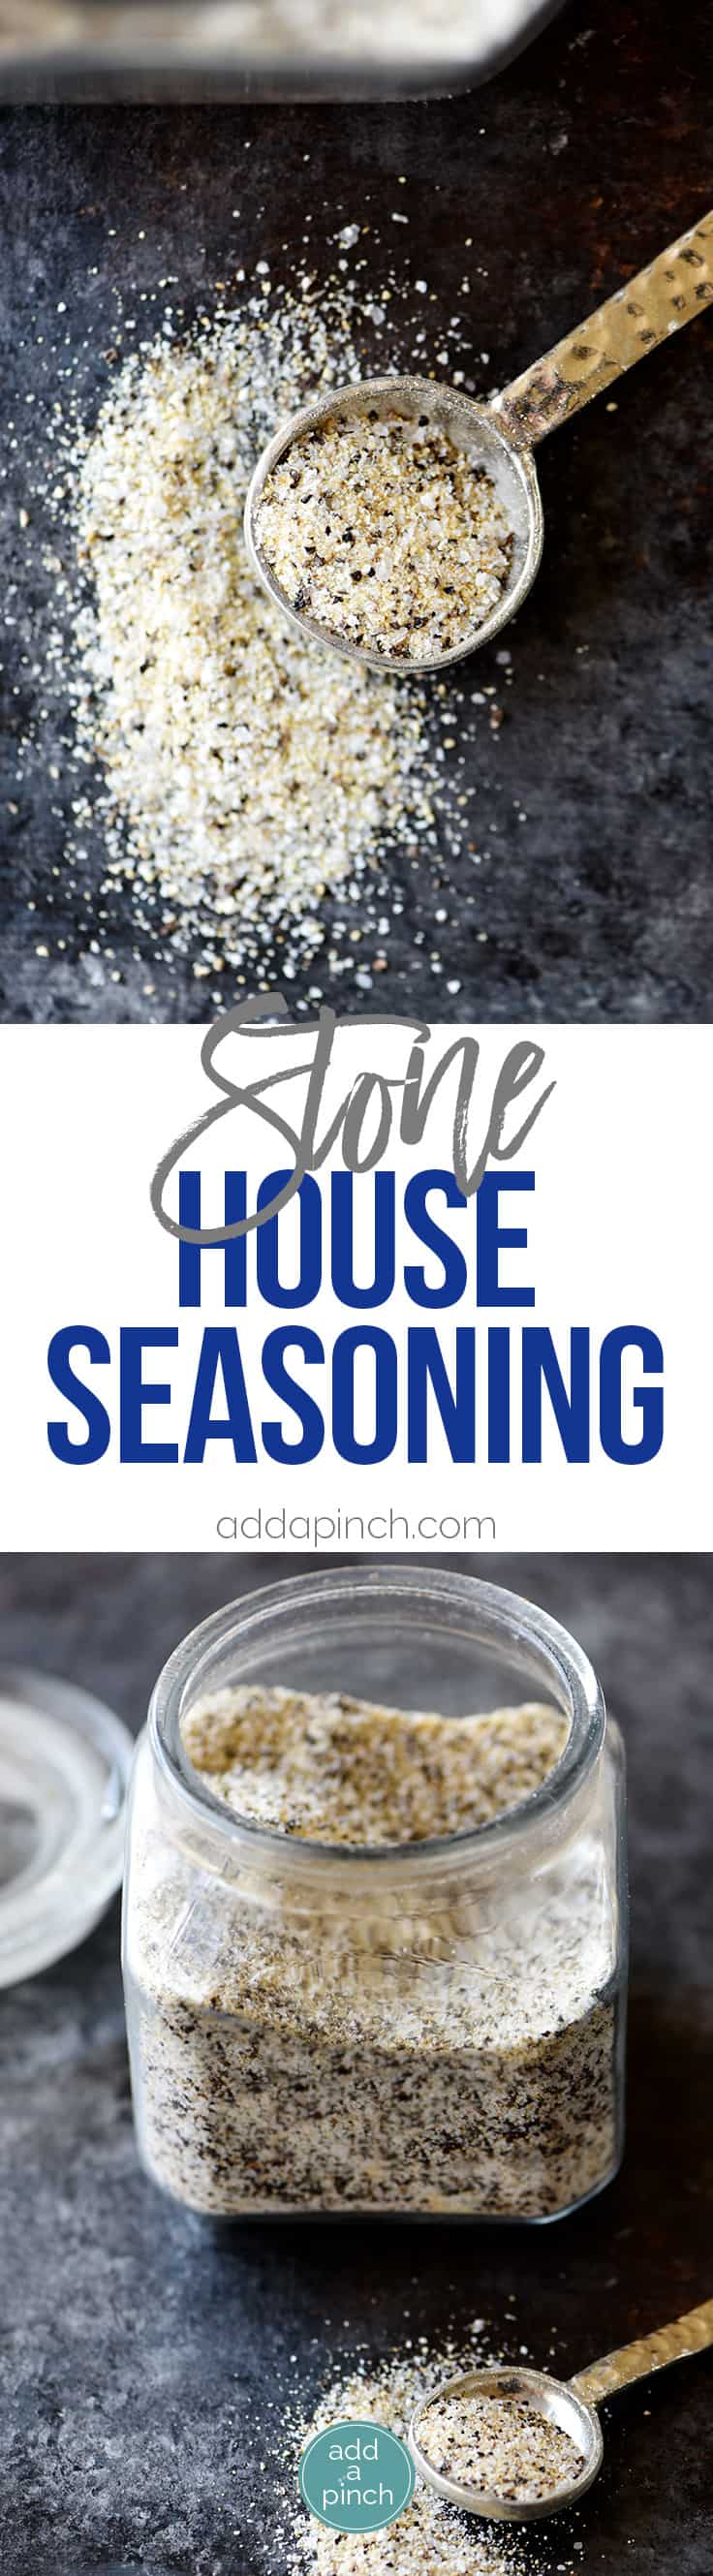 title   Stone House Seasoning